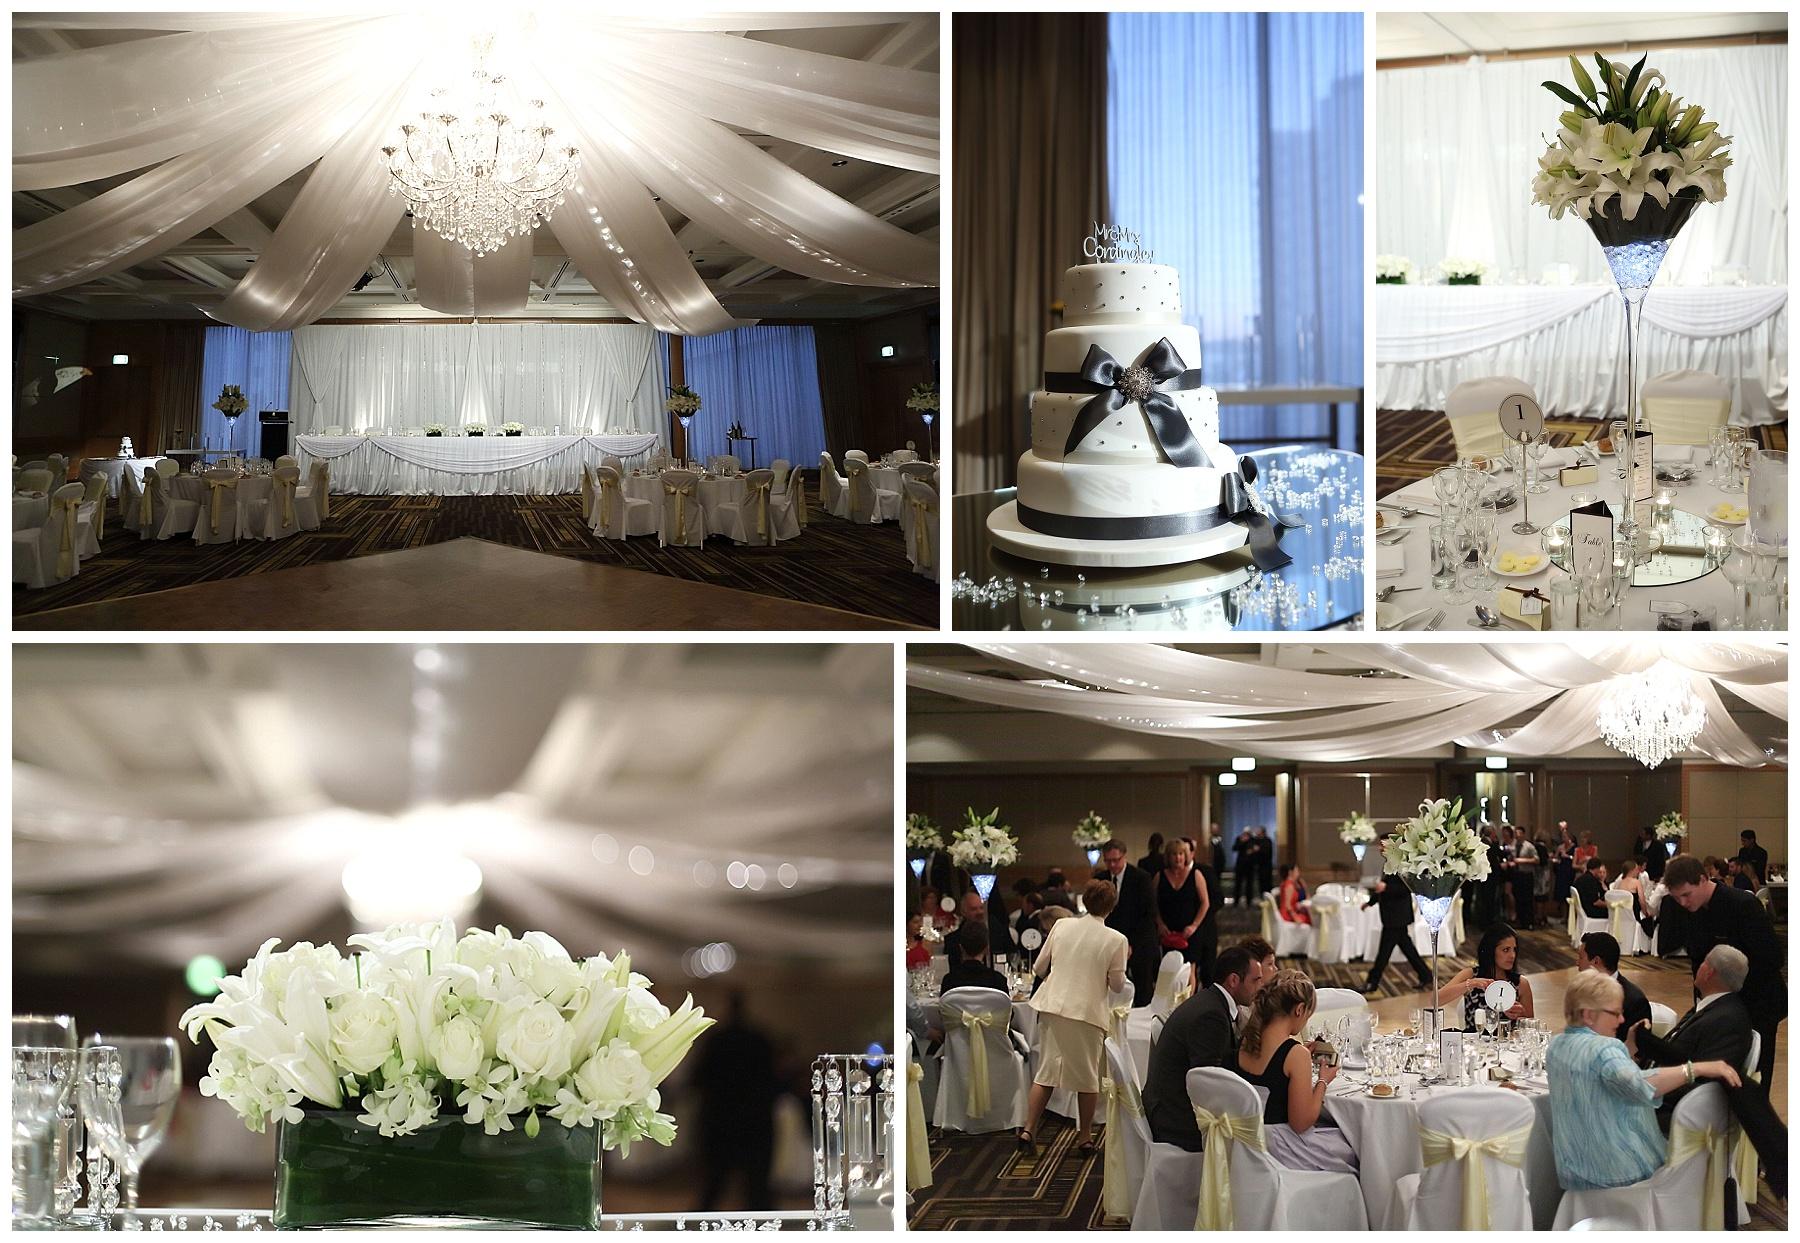 White flowers wedding reception styling